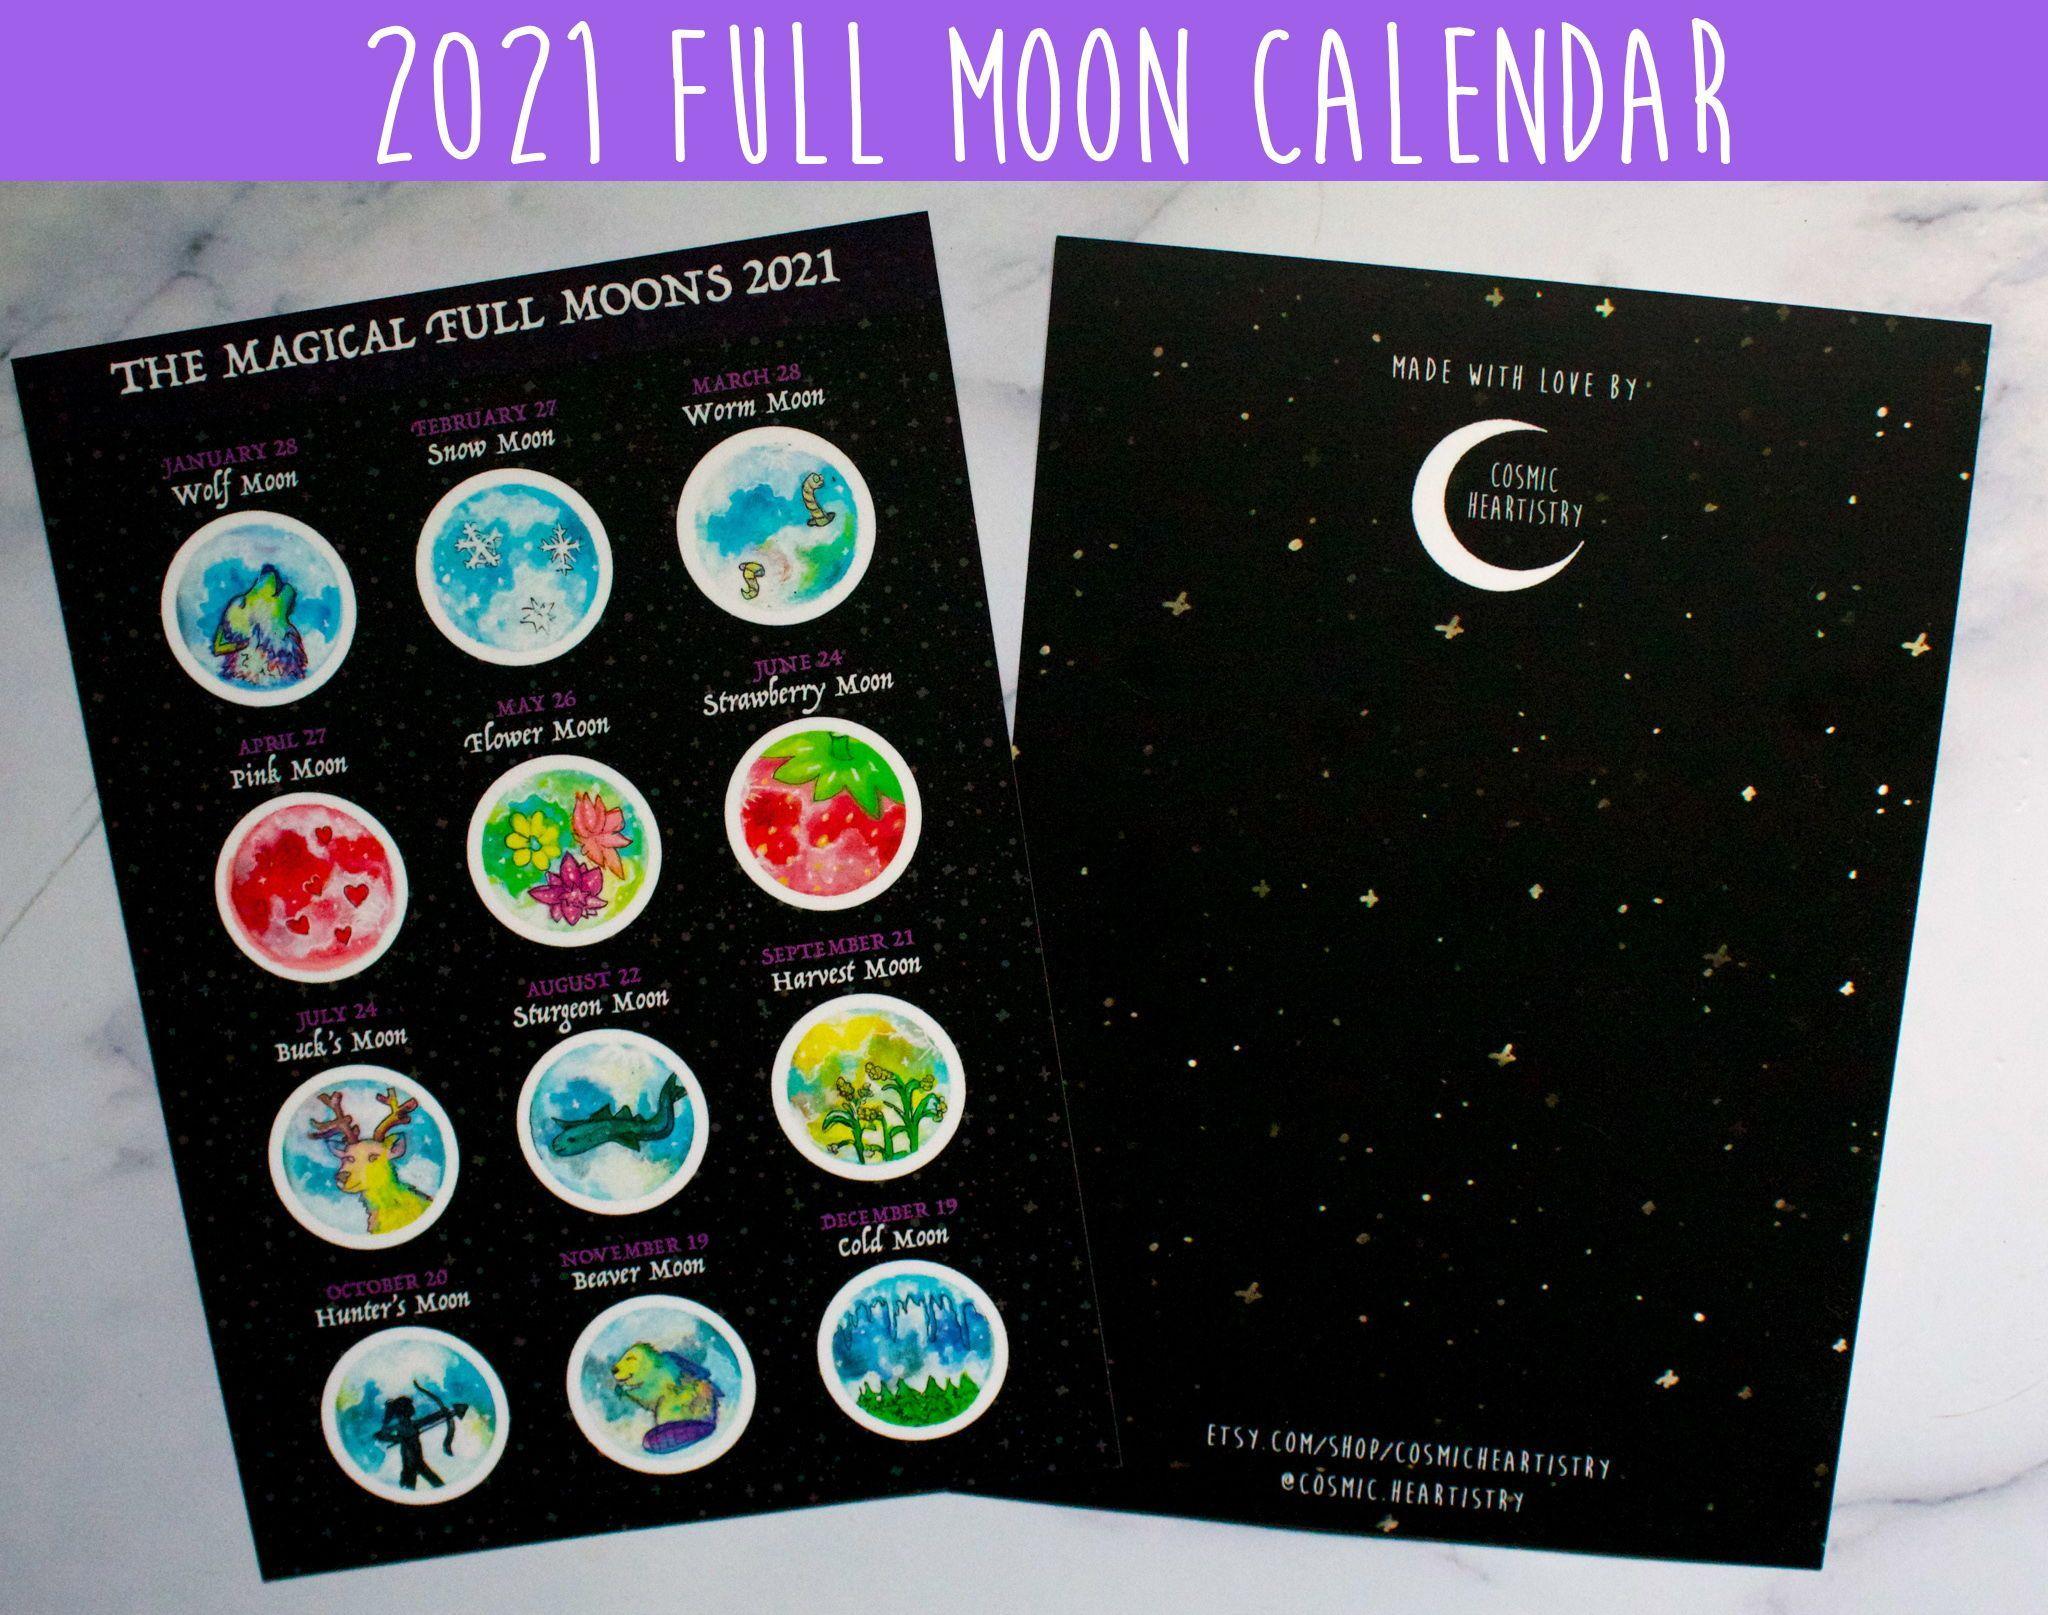 2021 Magic Full Moon Lunar Calendar Traditional Full Moon throughout Full Moon Calendar 2021 Printable